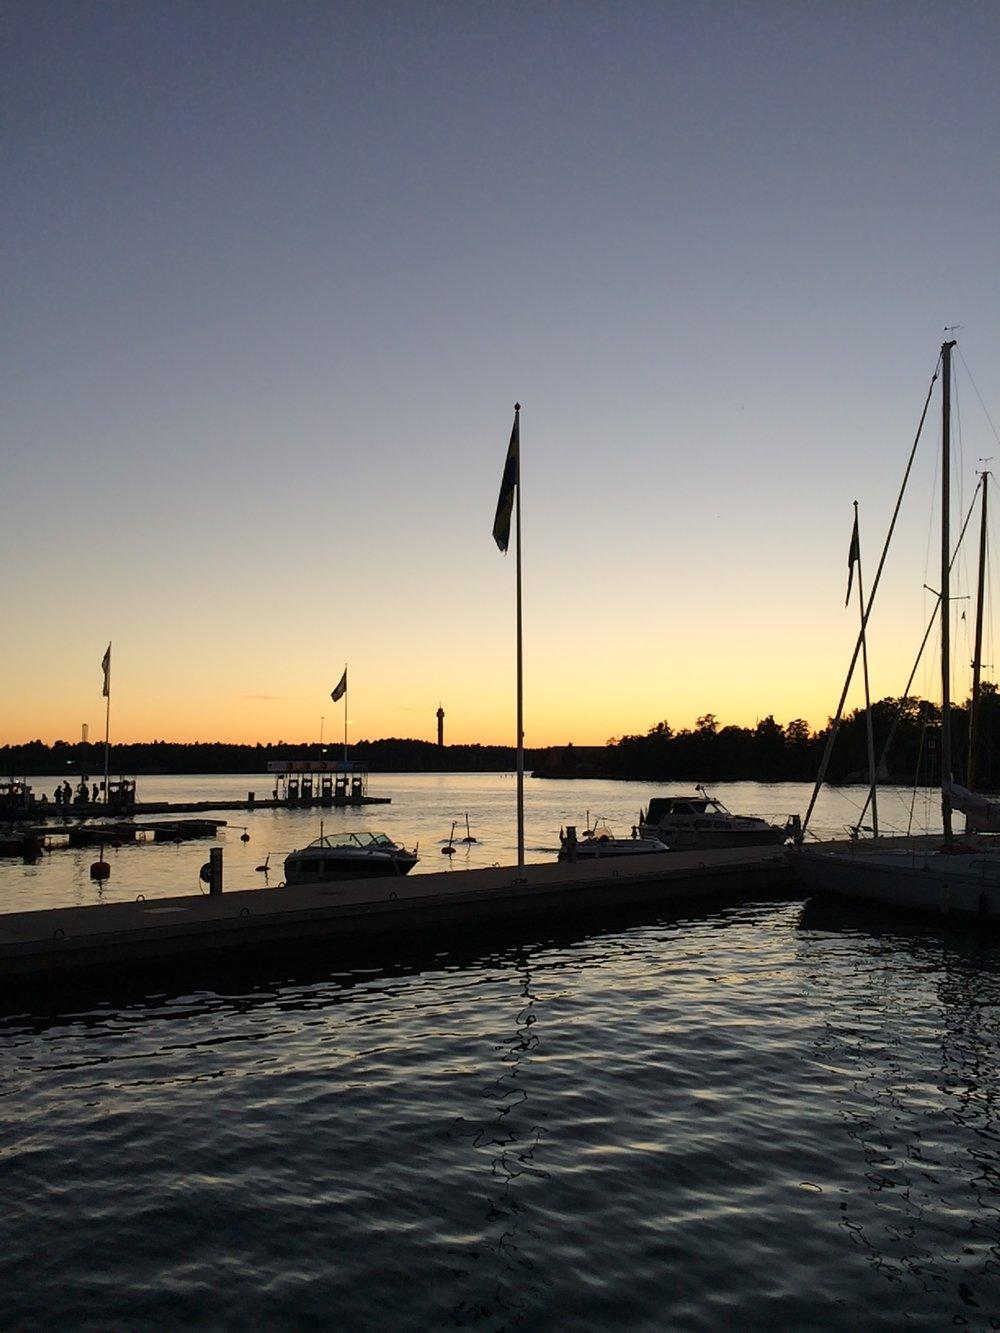 A magical sunset at Fjäderholmarna